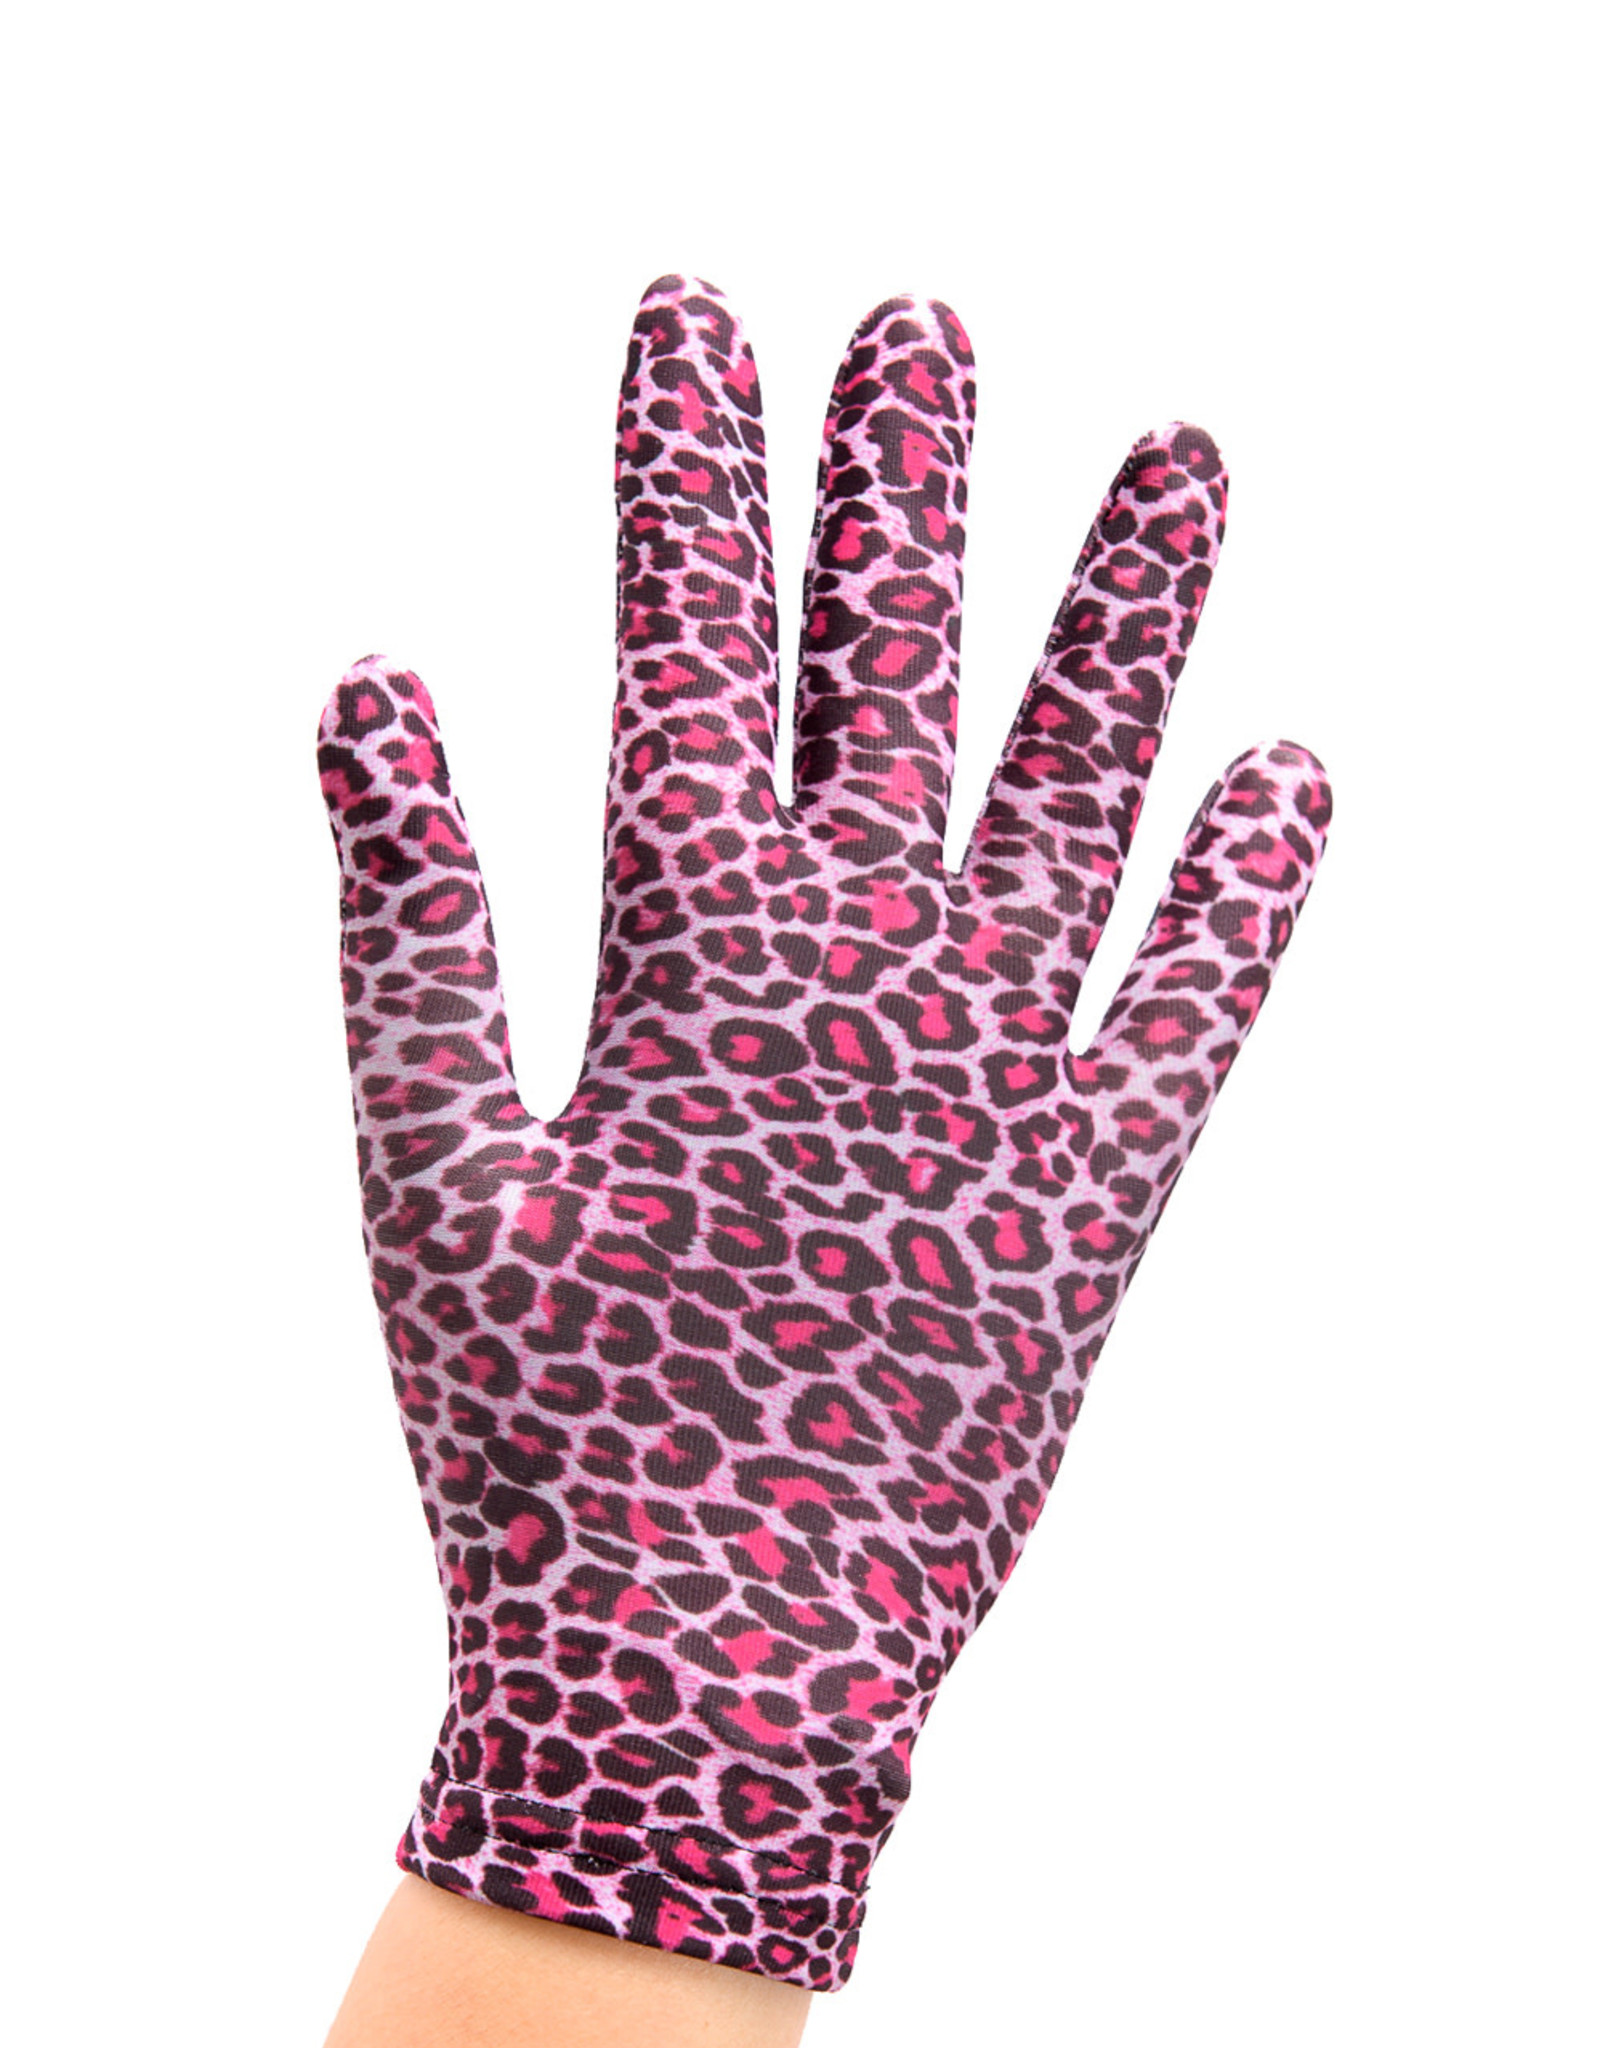 Sagester Gloves with Pink Leopard Motif 541